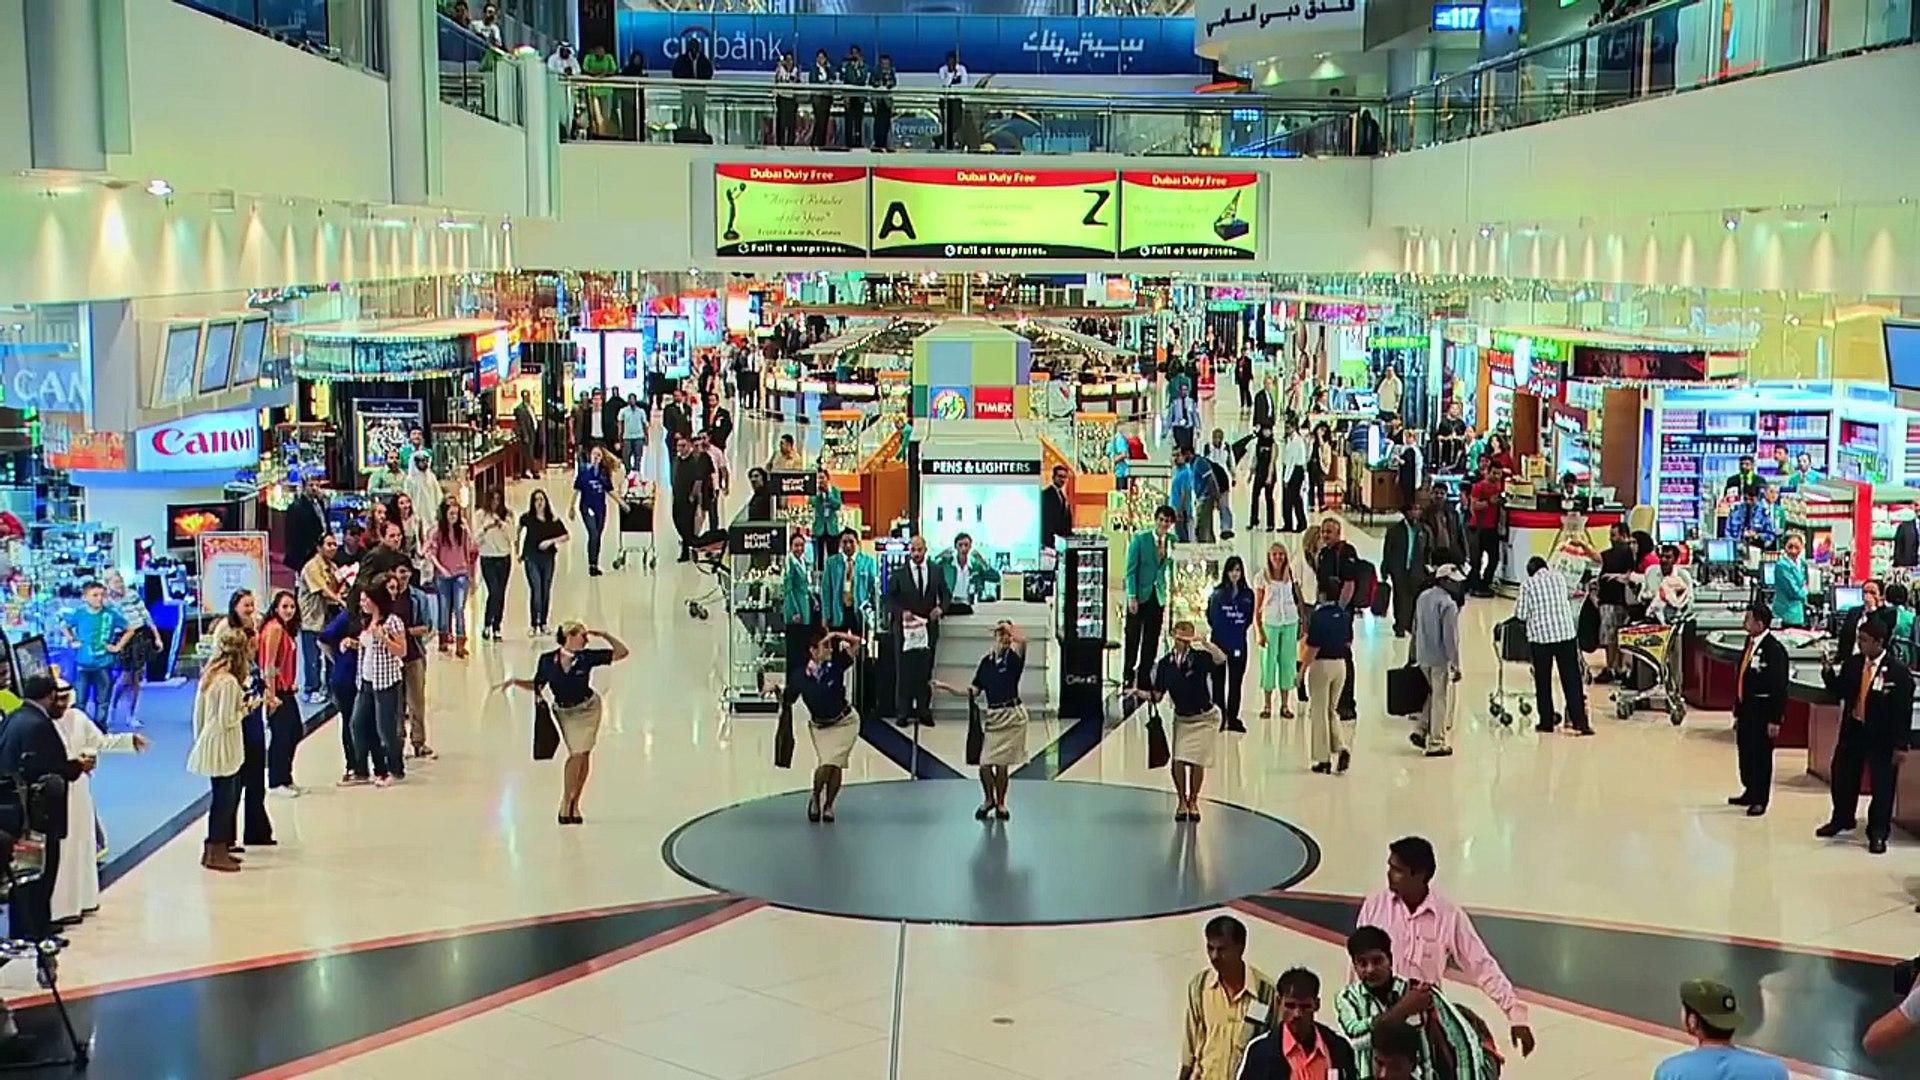 Флэшмоб аэропорт дубай купить квартиру в батуми грузия